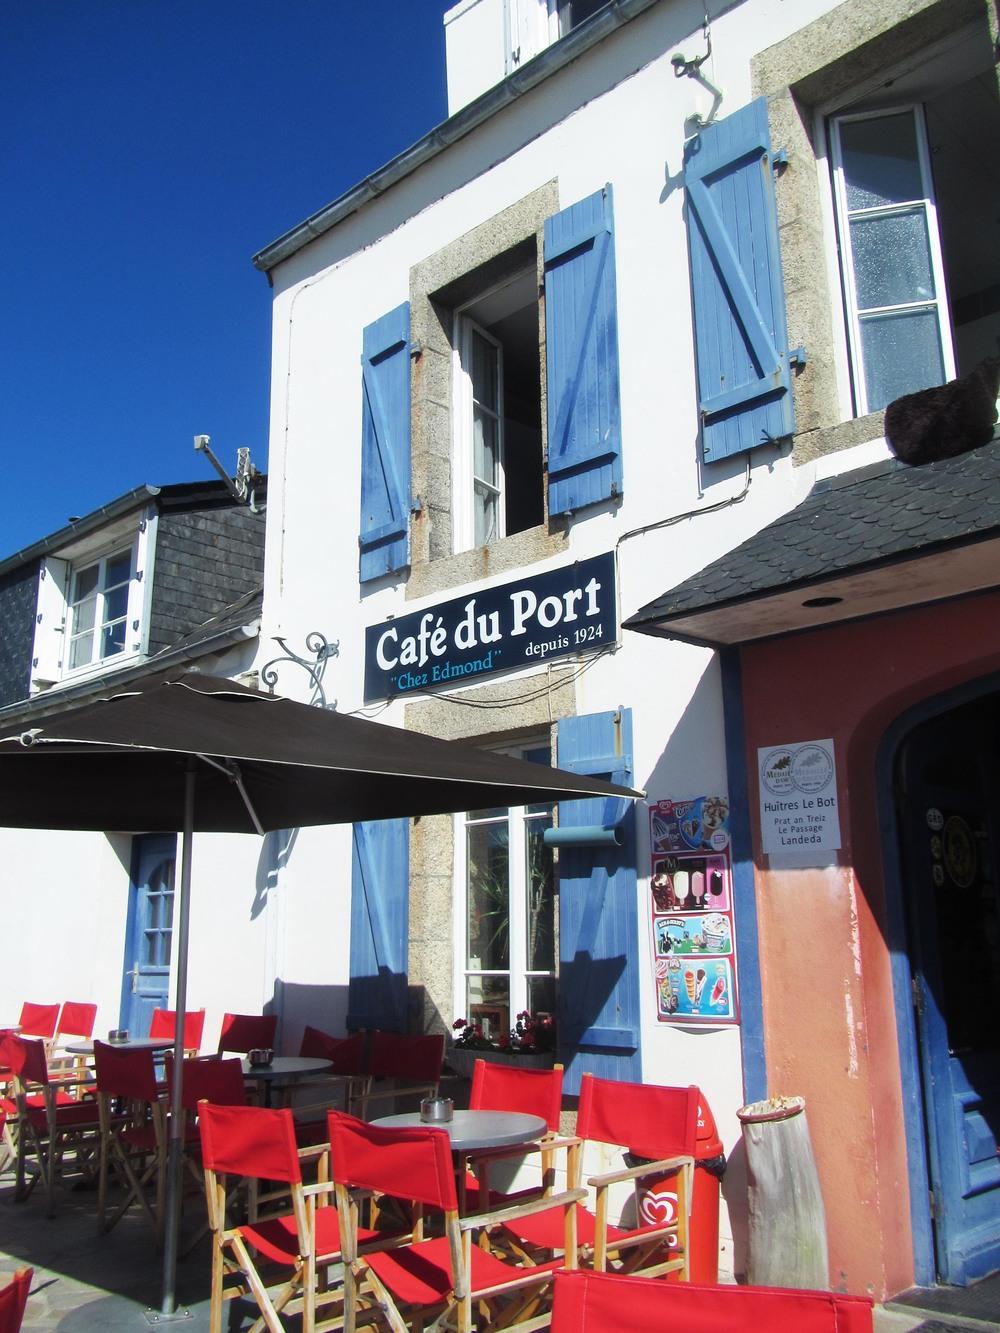 Cafe-du-port-brignon-plages.jpg